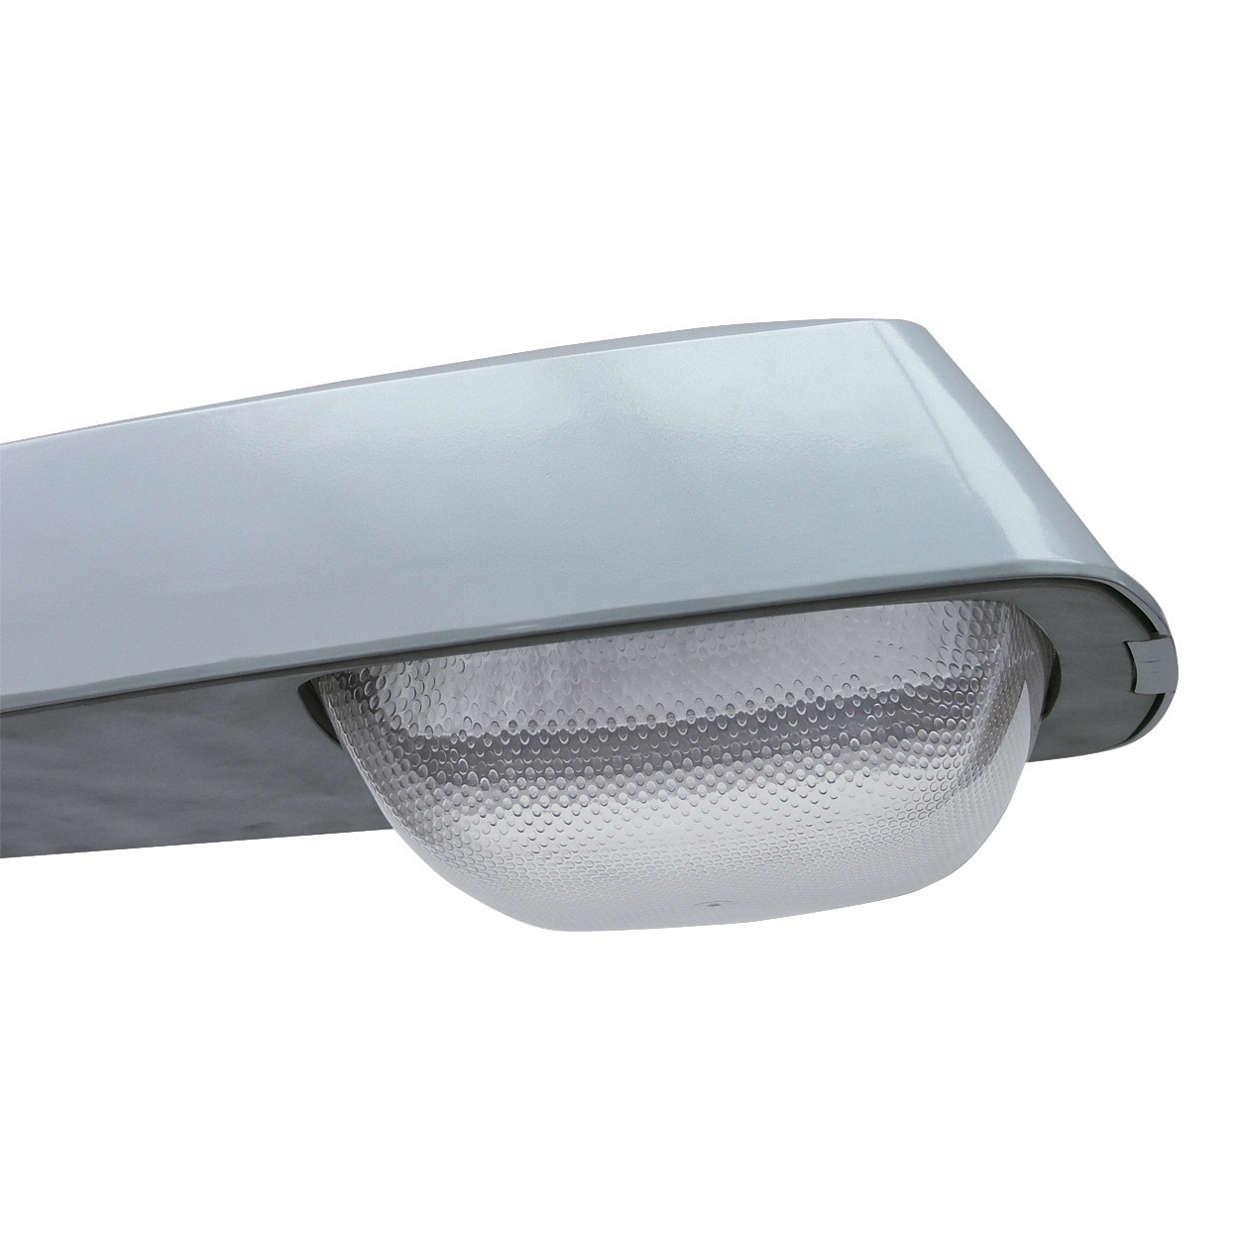 Koffer²- en ekonomisk belysningslösning